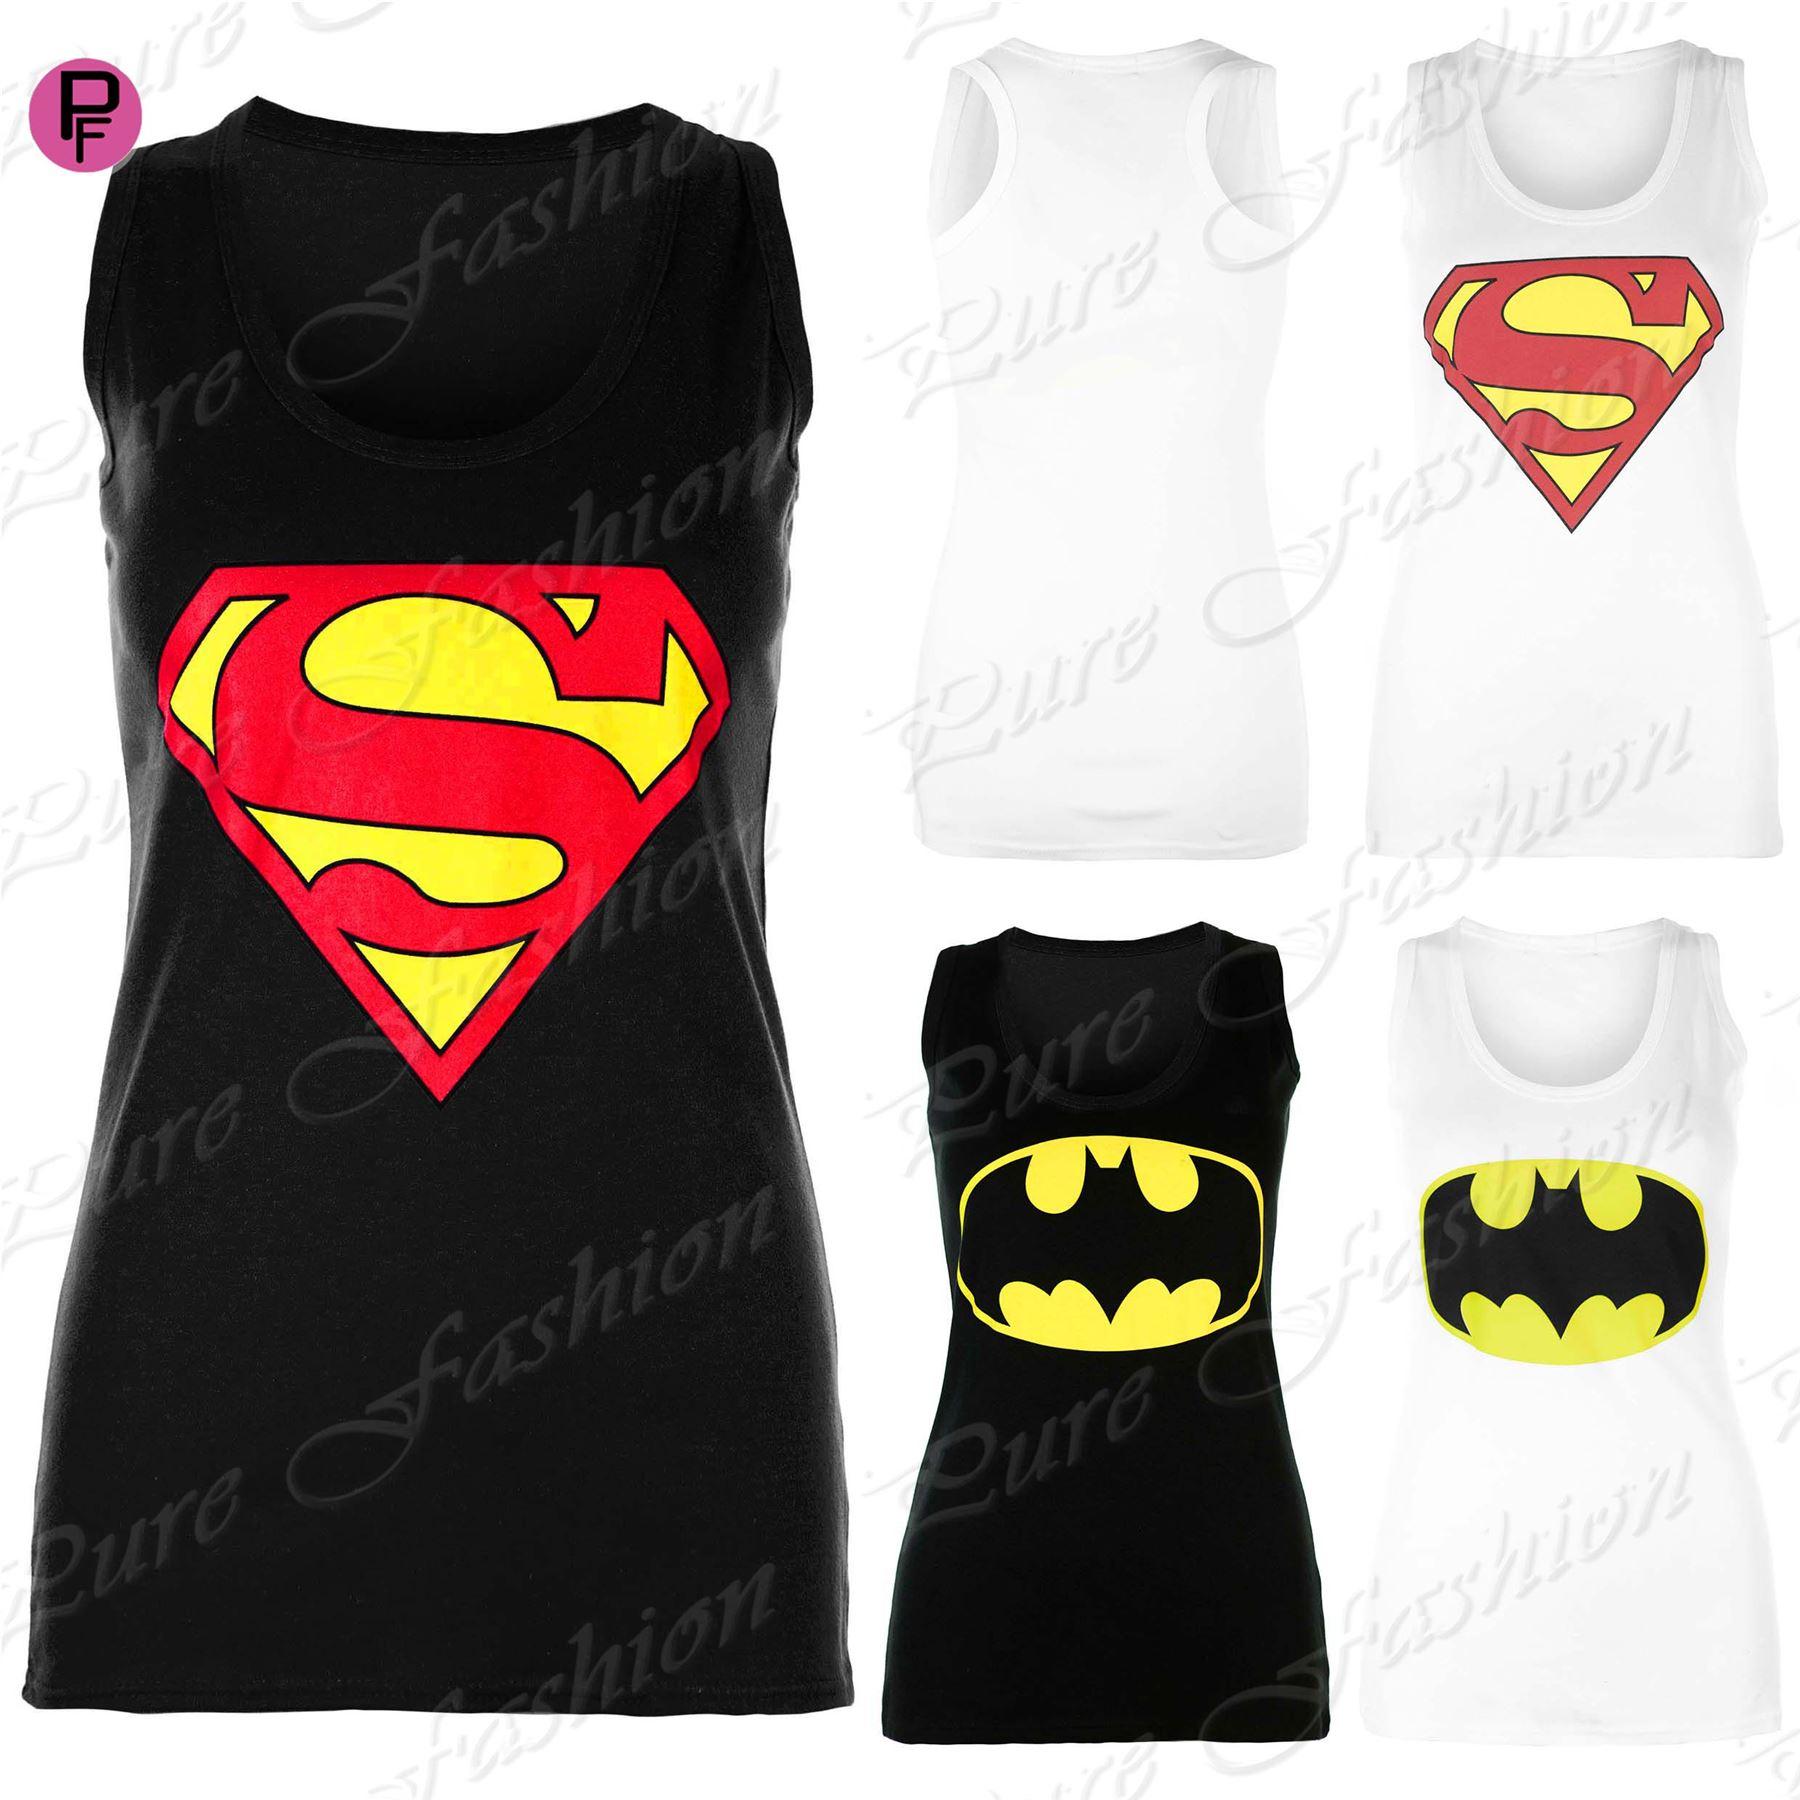 Womens Ladies Muscle Racer Back Sleeveless Superman Batman T Tee Shirt Vest Top